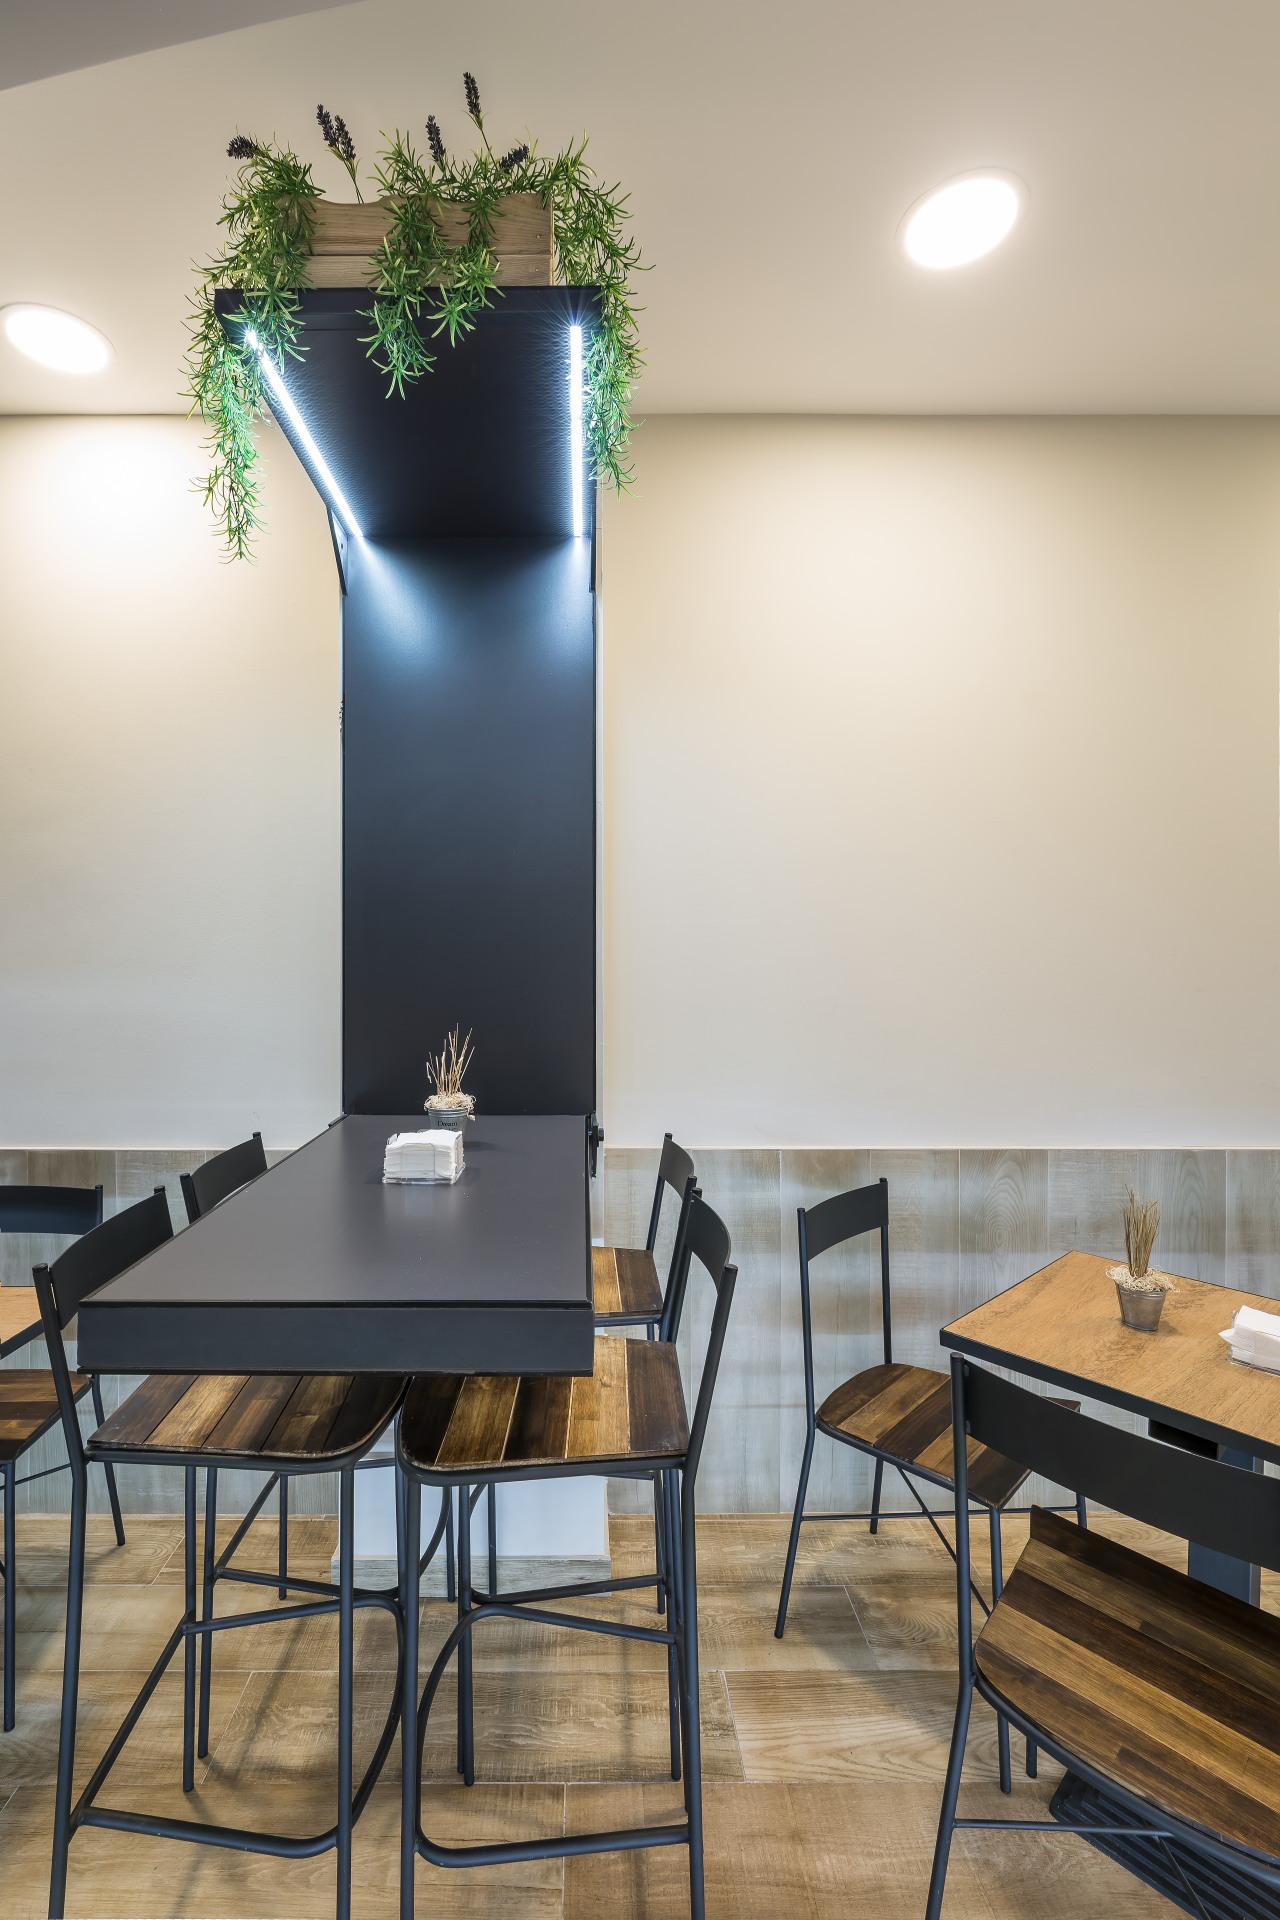 fotografia-arquitectura-interiorismo-valencia-german-cabo-viraje-pasteleria-mahori (4)